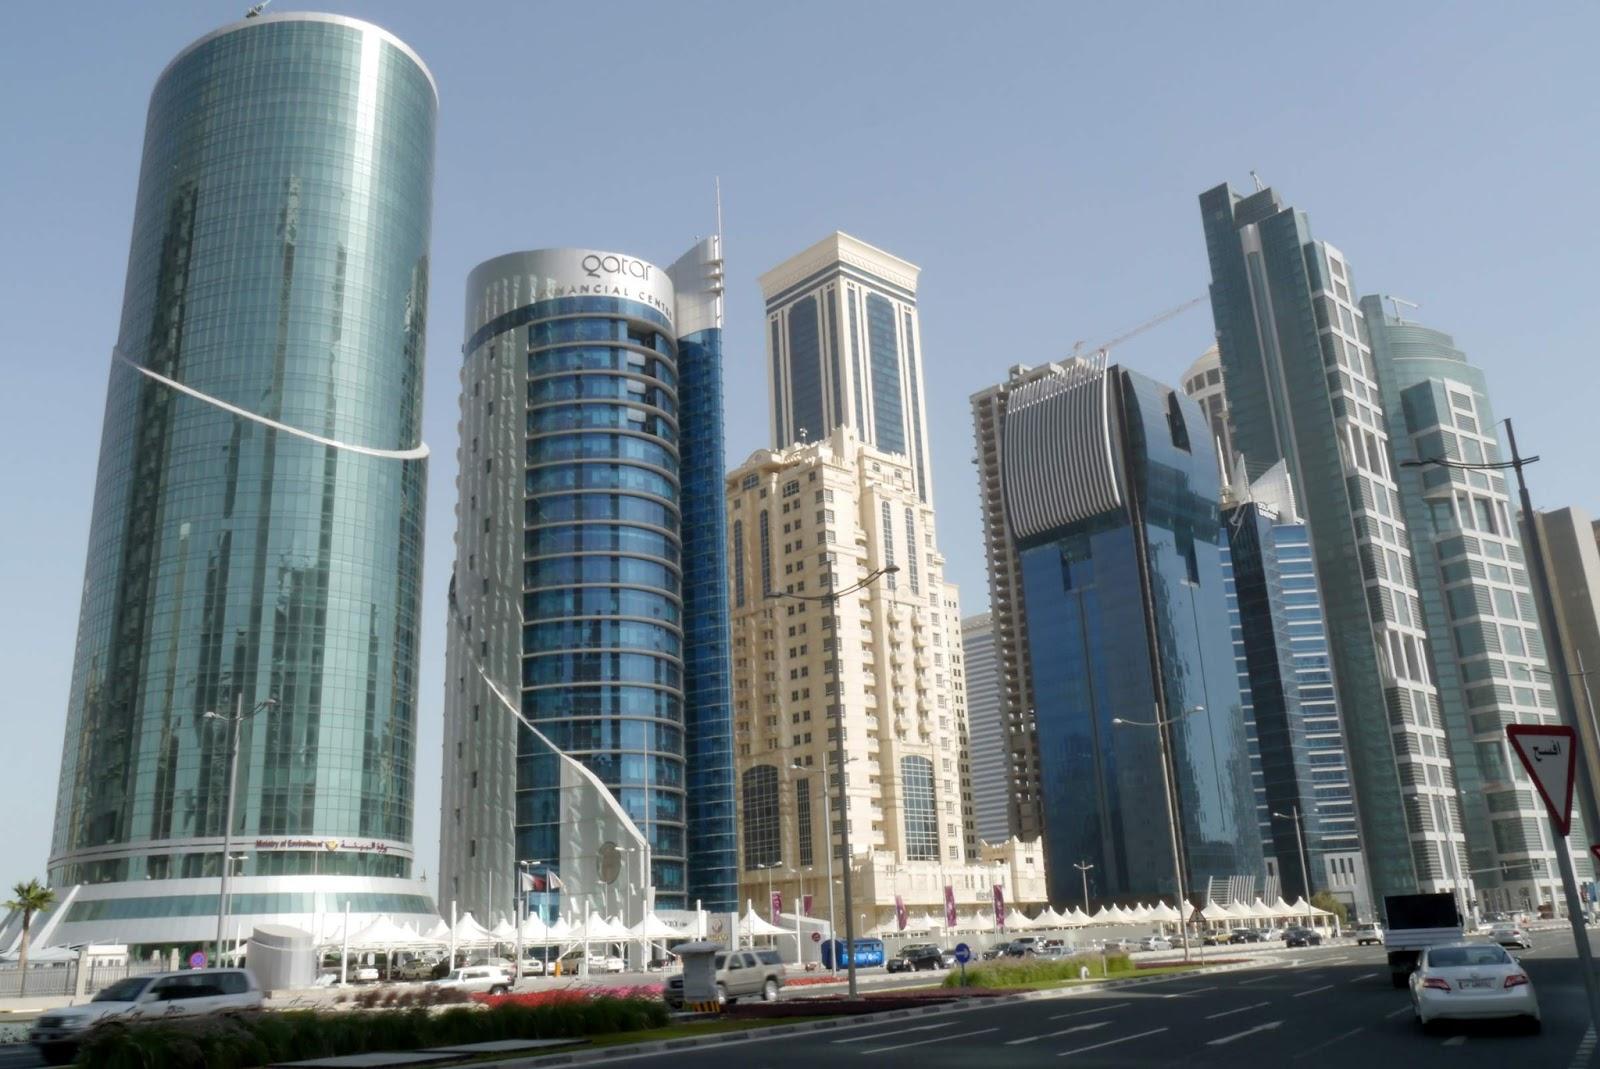 qatar - photo #21